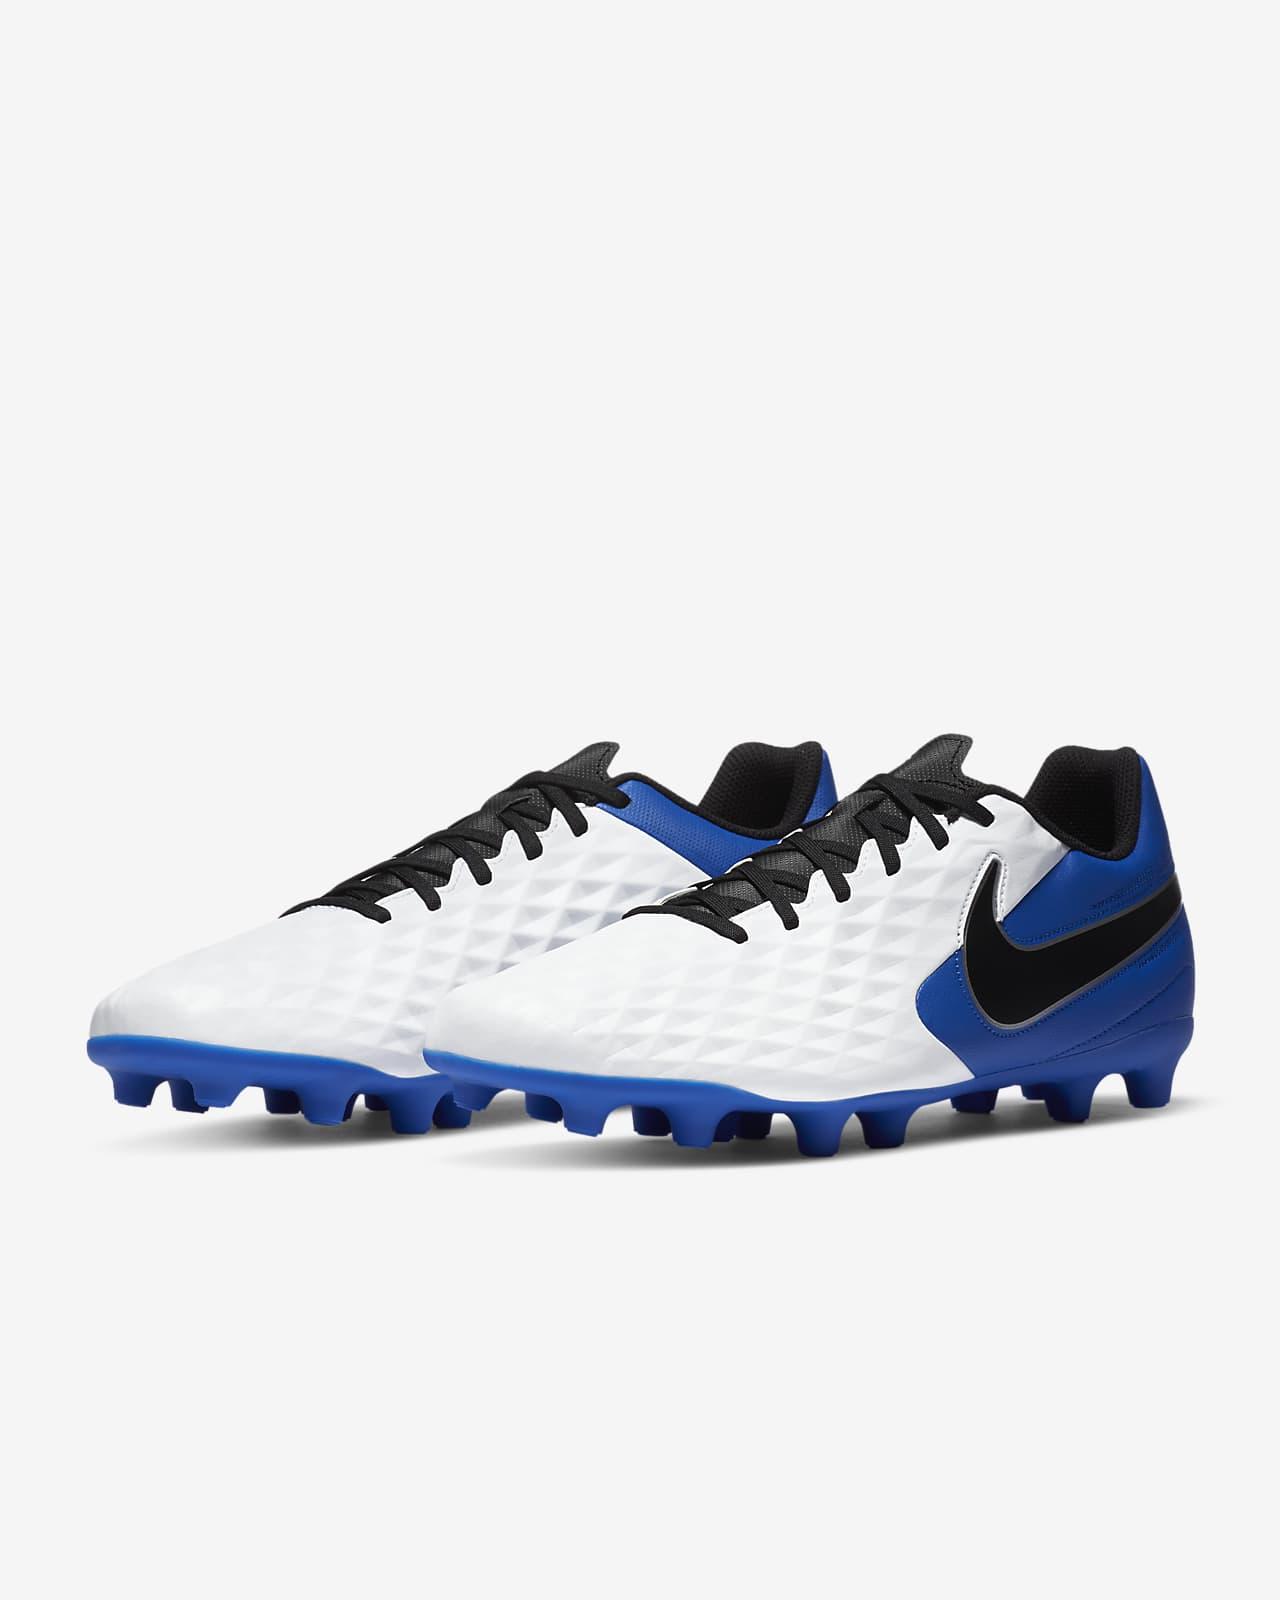 diario Robusto Fortalecer  Nike Tiempo Legend 8 Club MG Multi-Ground Football Boot. Nike IE